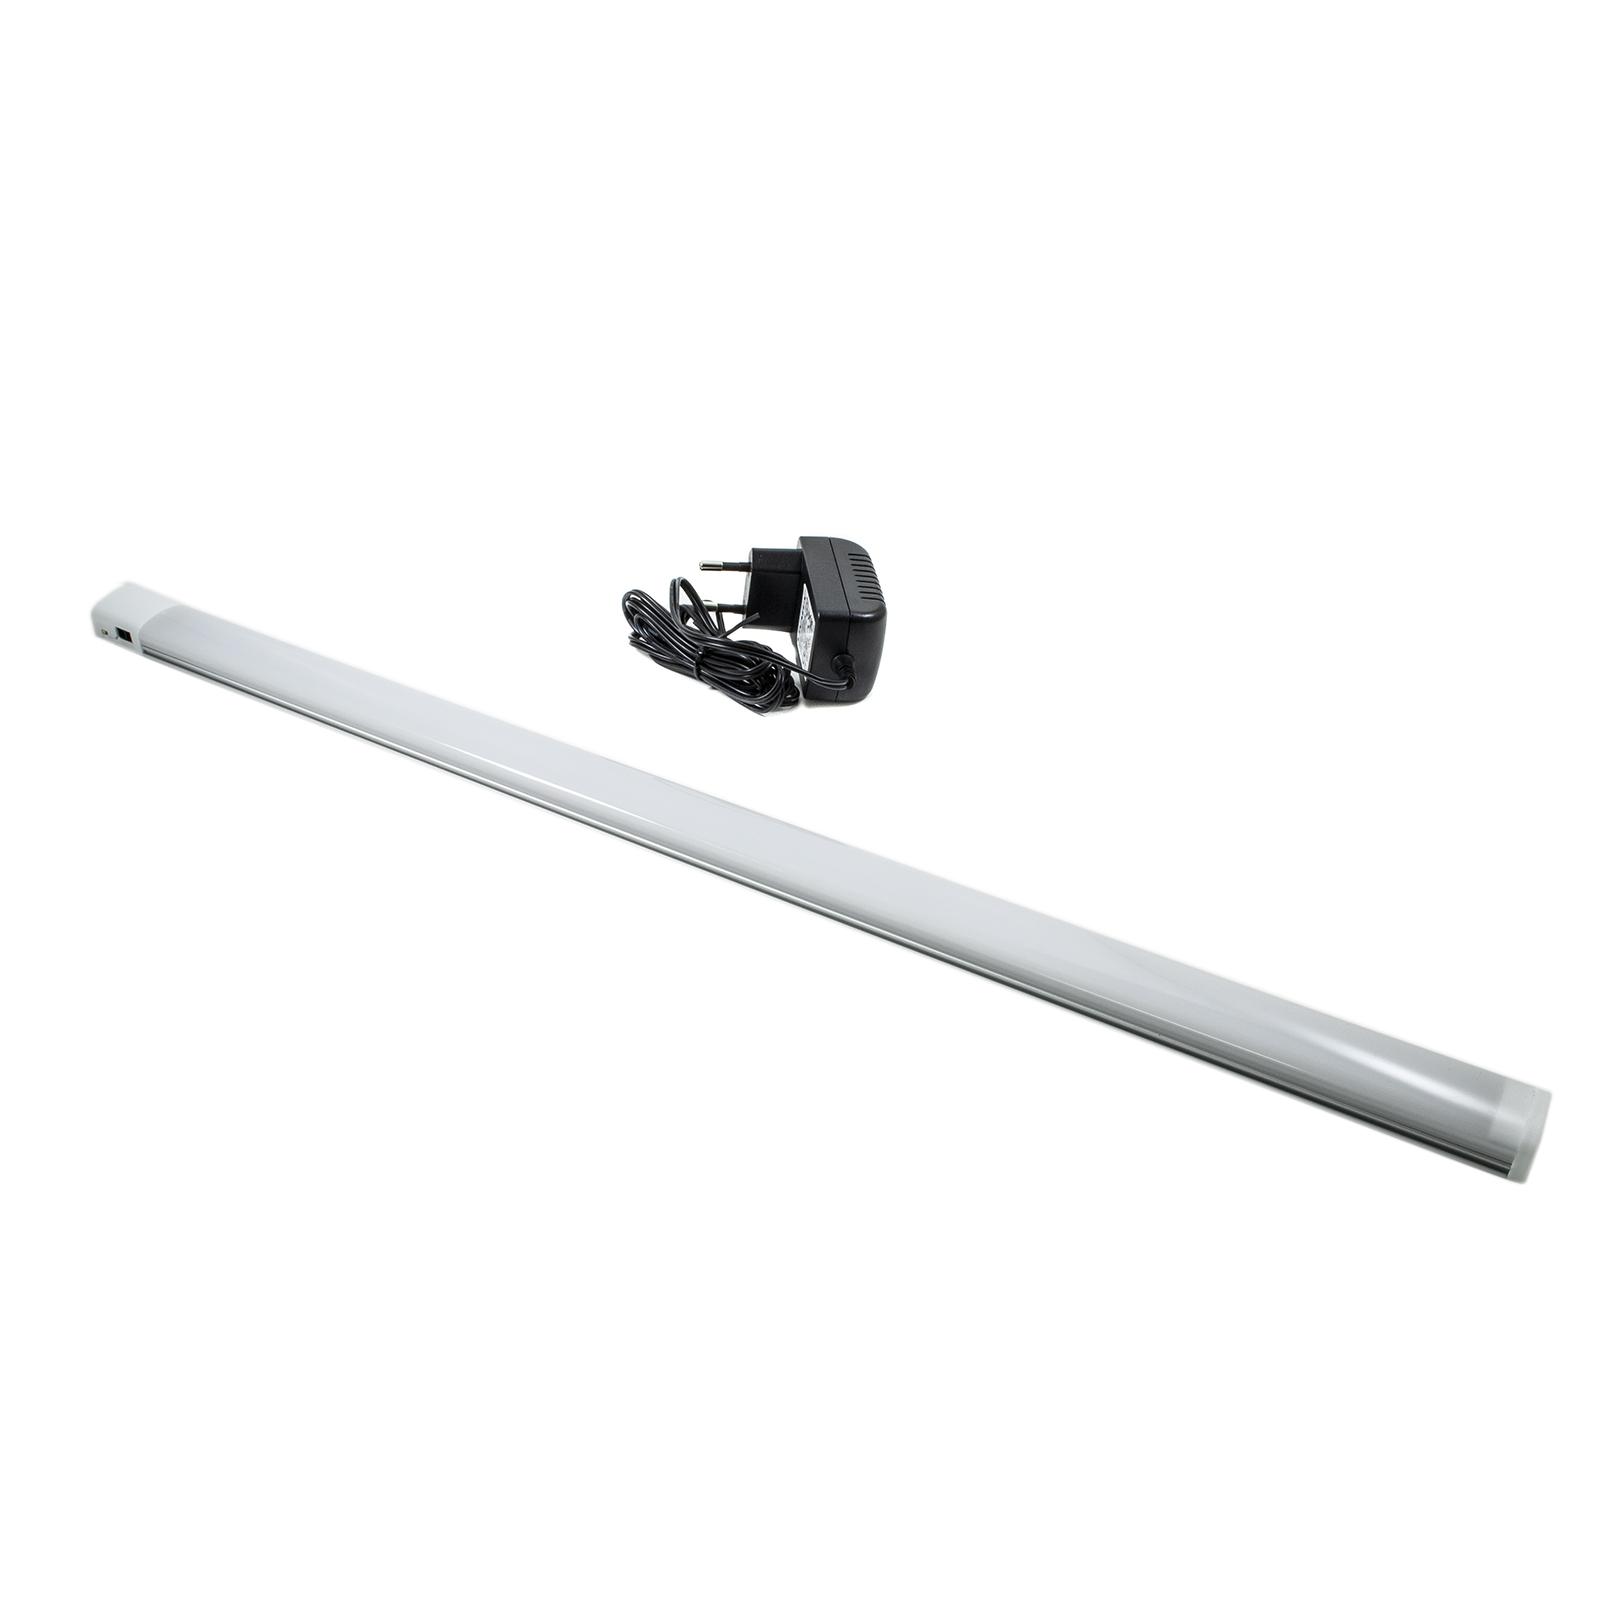 crossled: Lampada sottopensile led illuminazione interno mobile ...